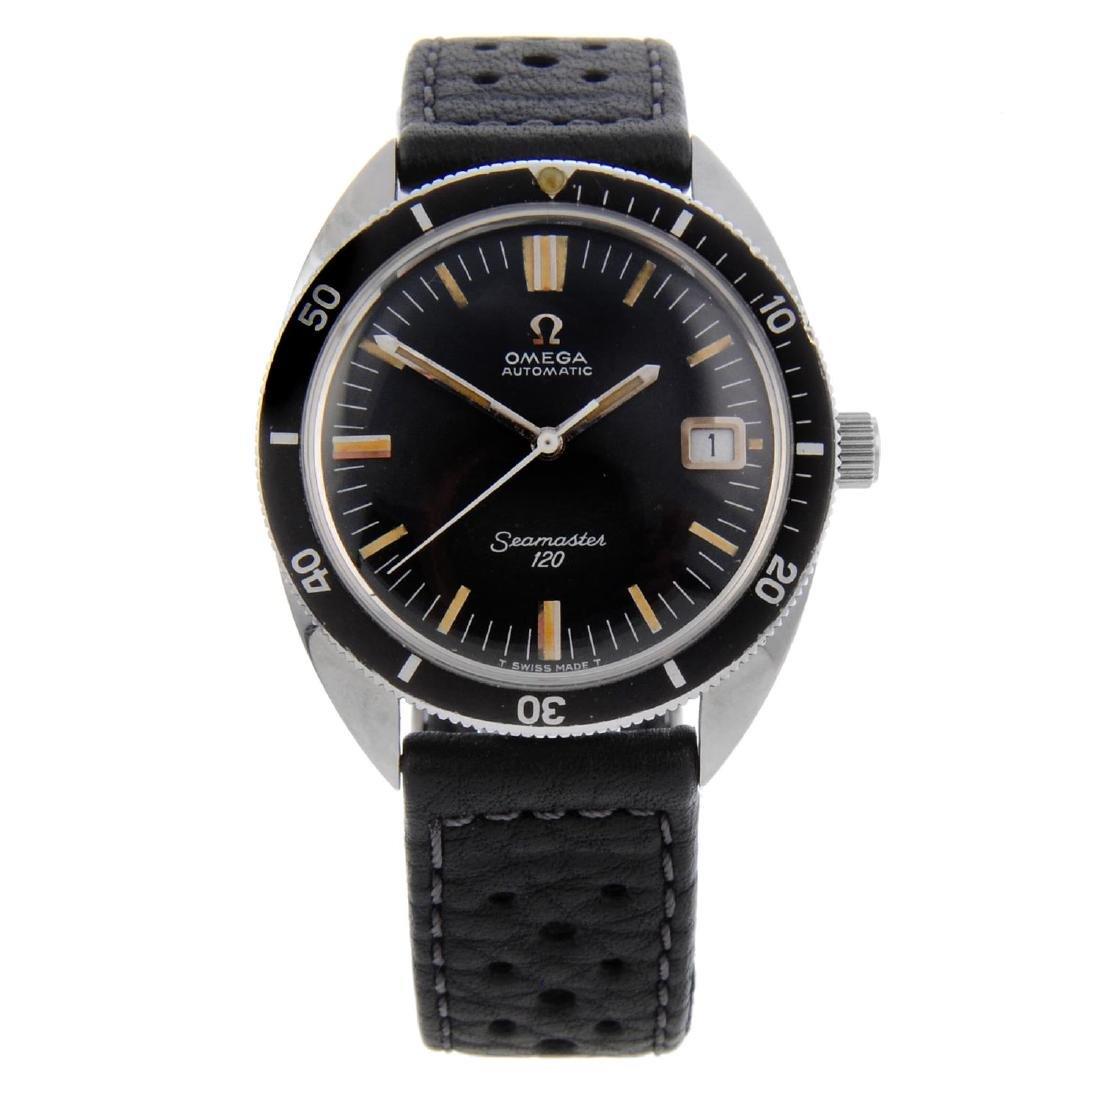 OMEGA - a gentleman's Seamaster 120M wrist watch.